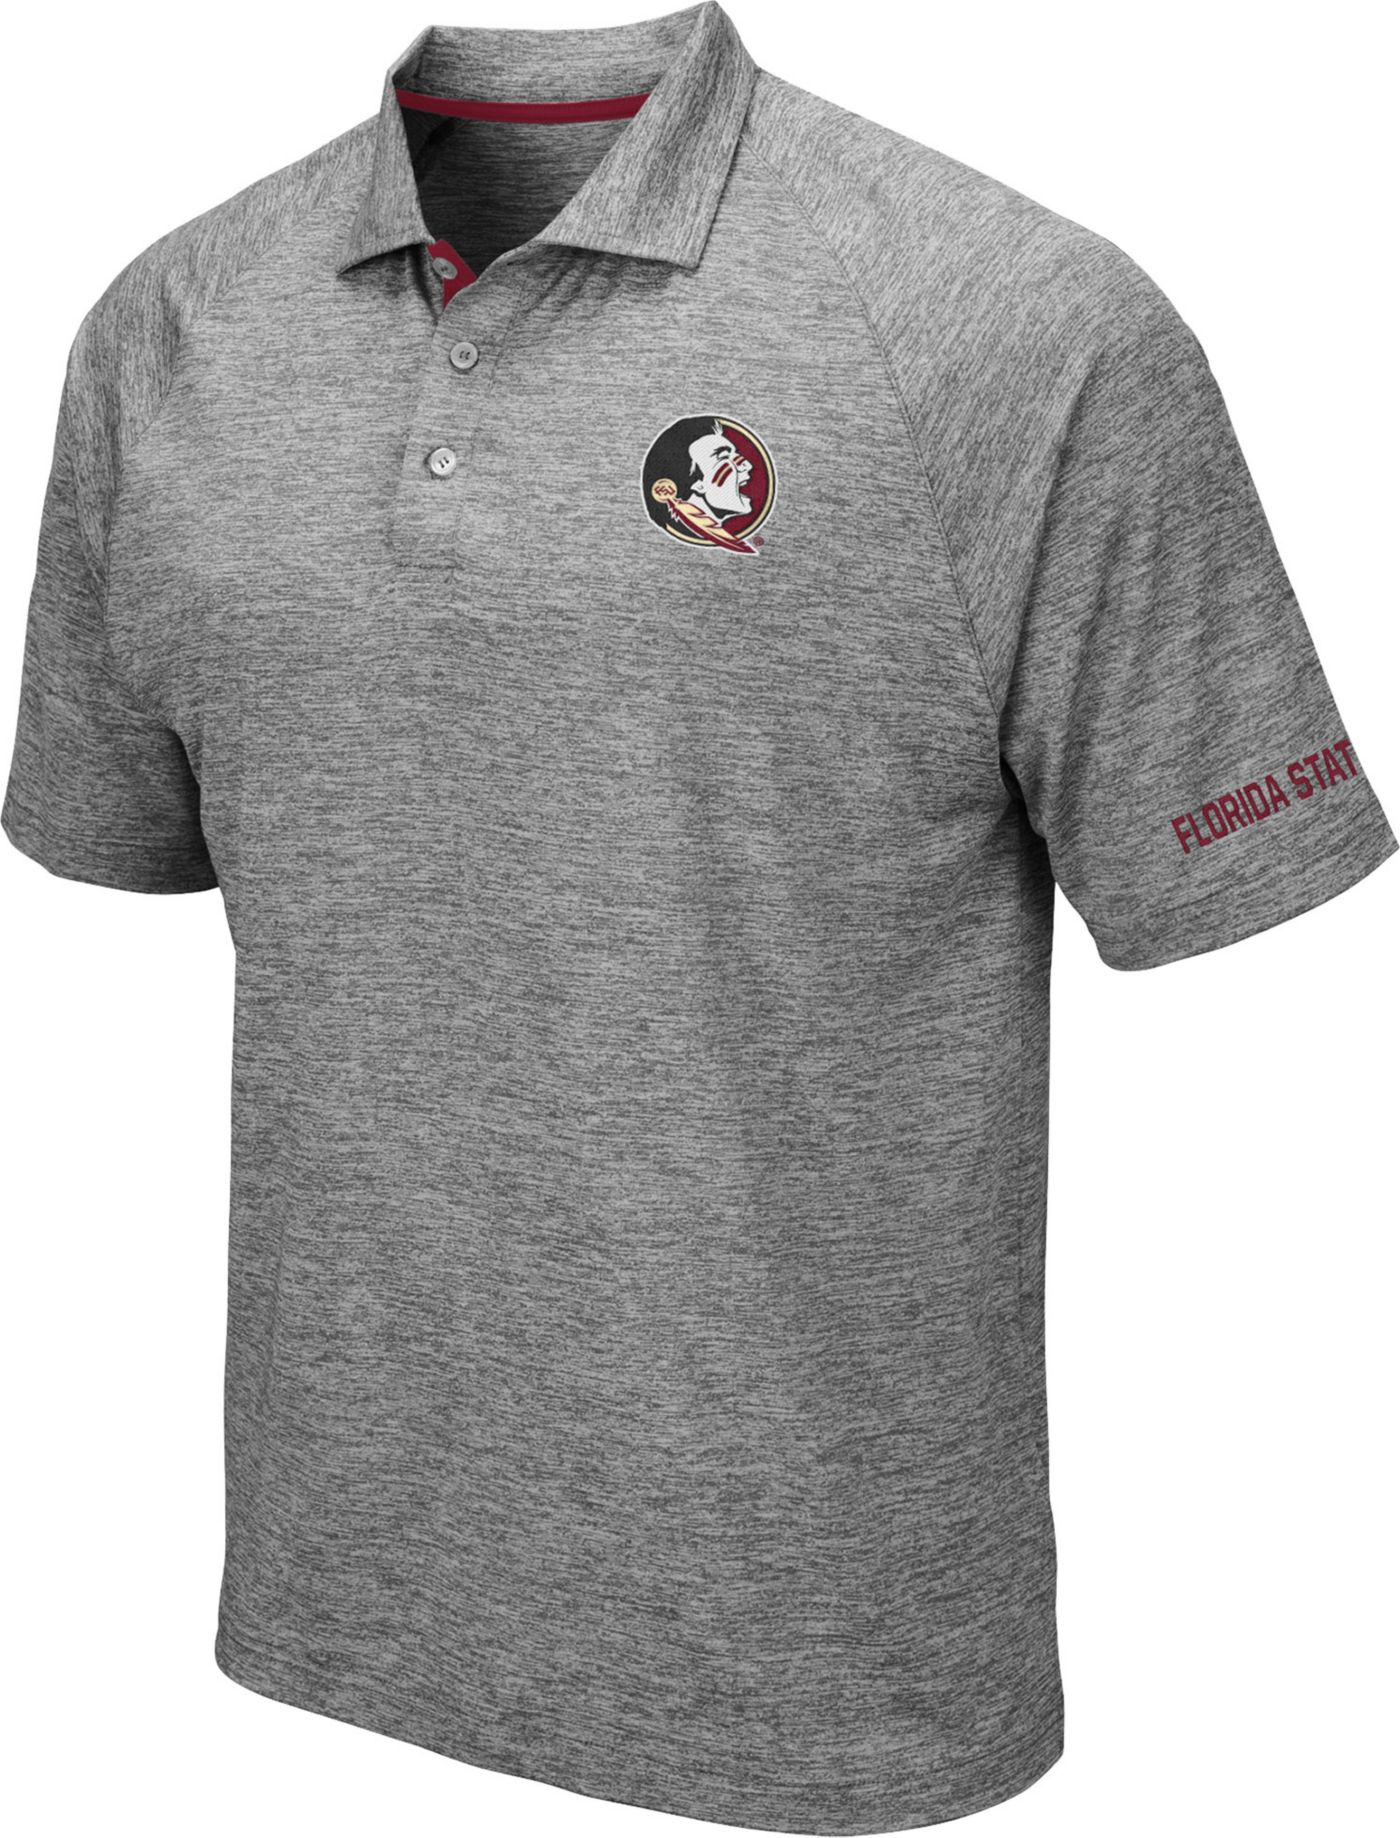 Colosseum Men's Florida State Seminoles Grey Chip Shot Polo